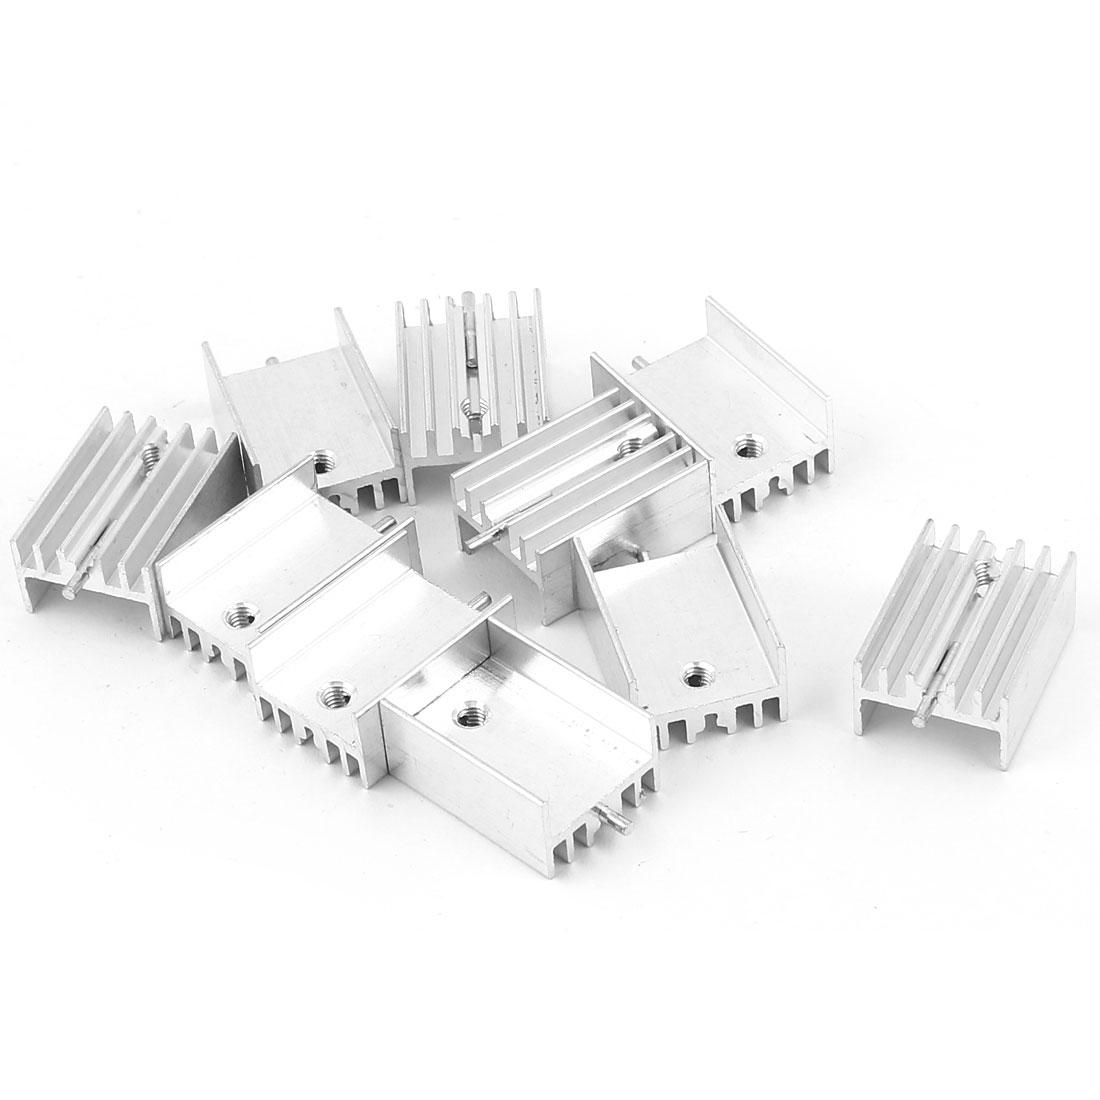 10 Pcs Aluminum Heatsinks Radiator + Needle 20x15x10mm Silver Tone for Mosfet IC